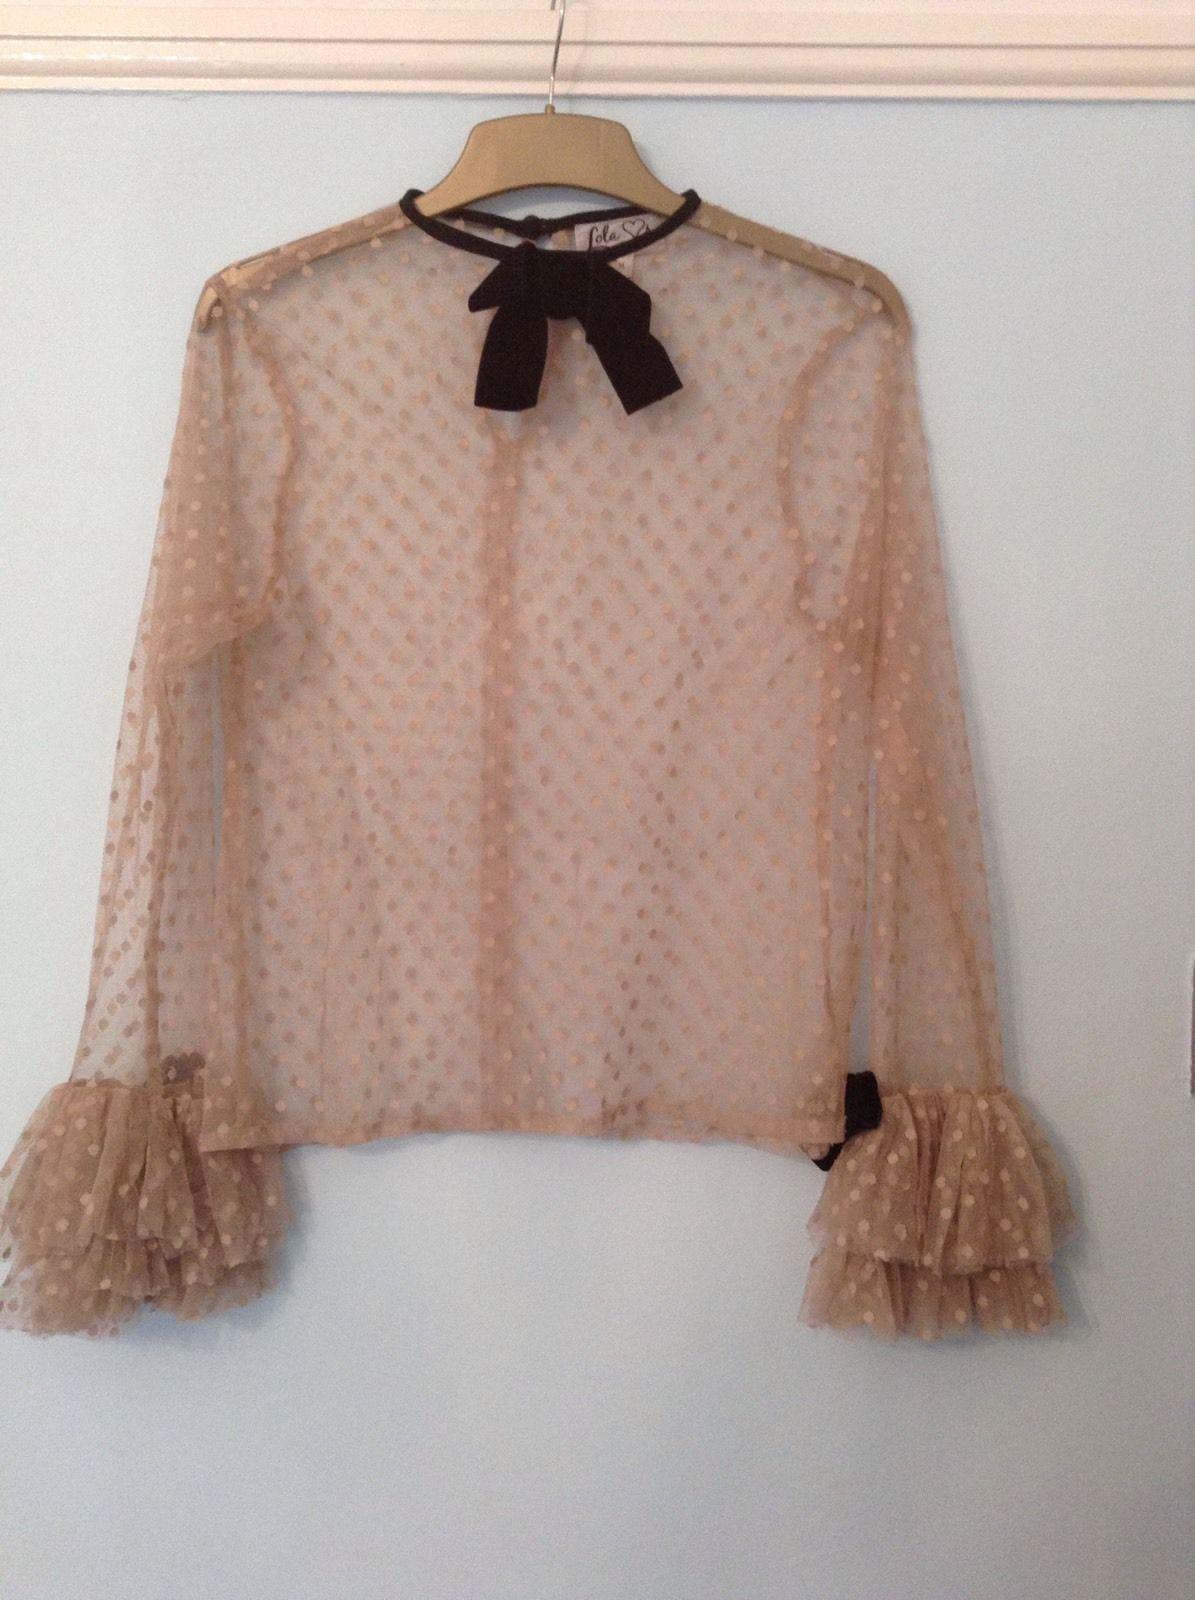 Lola Loves Peach And Black Top With Ruffle Sleeves Medium | eBay